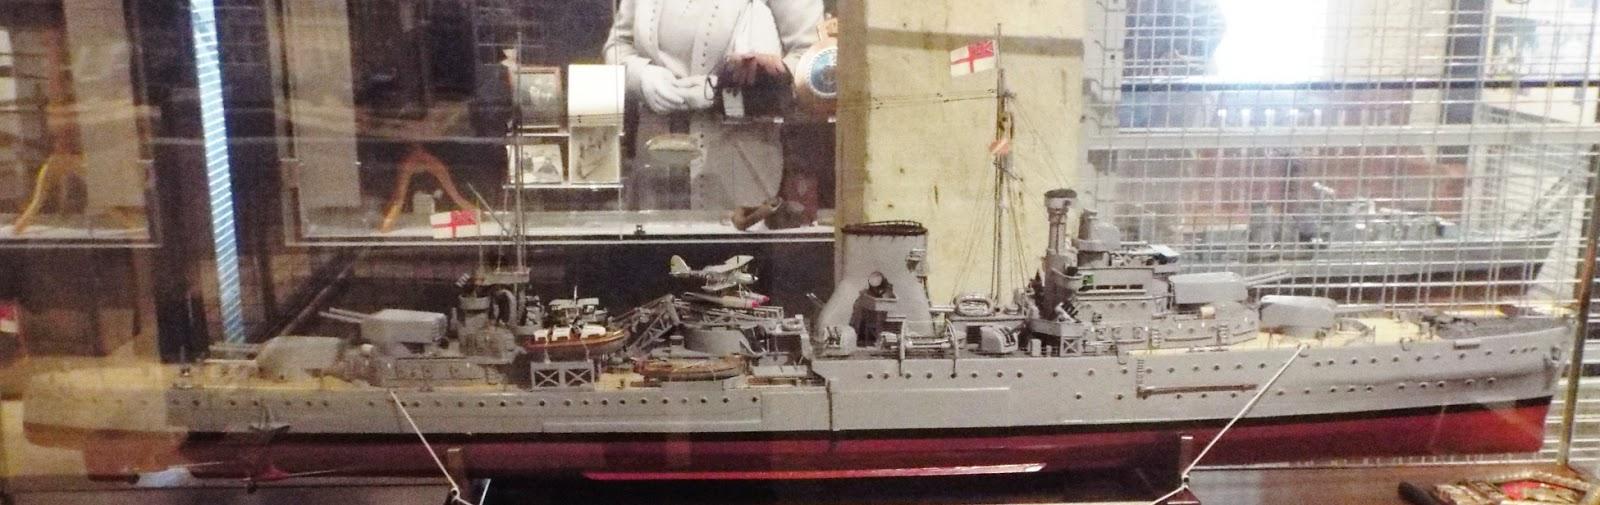 Wargaming Miscellany  The Historic Dockyard  Chatham  Kent